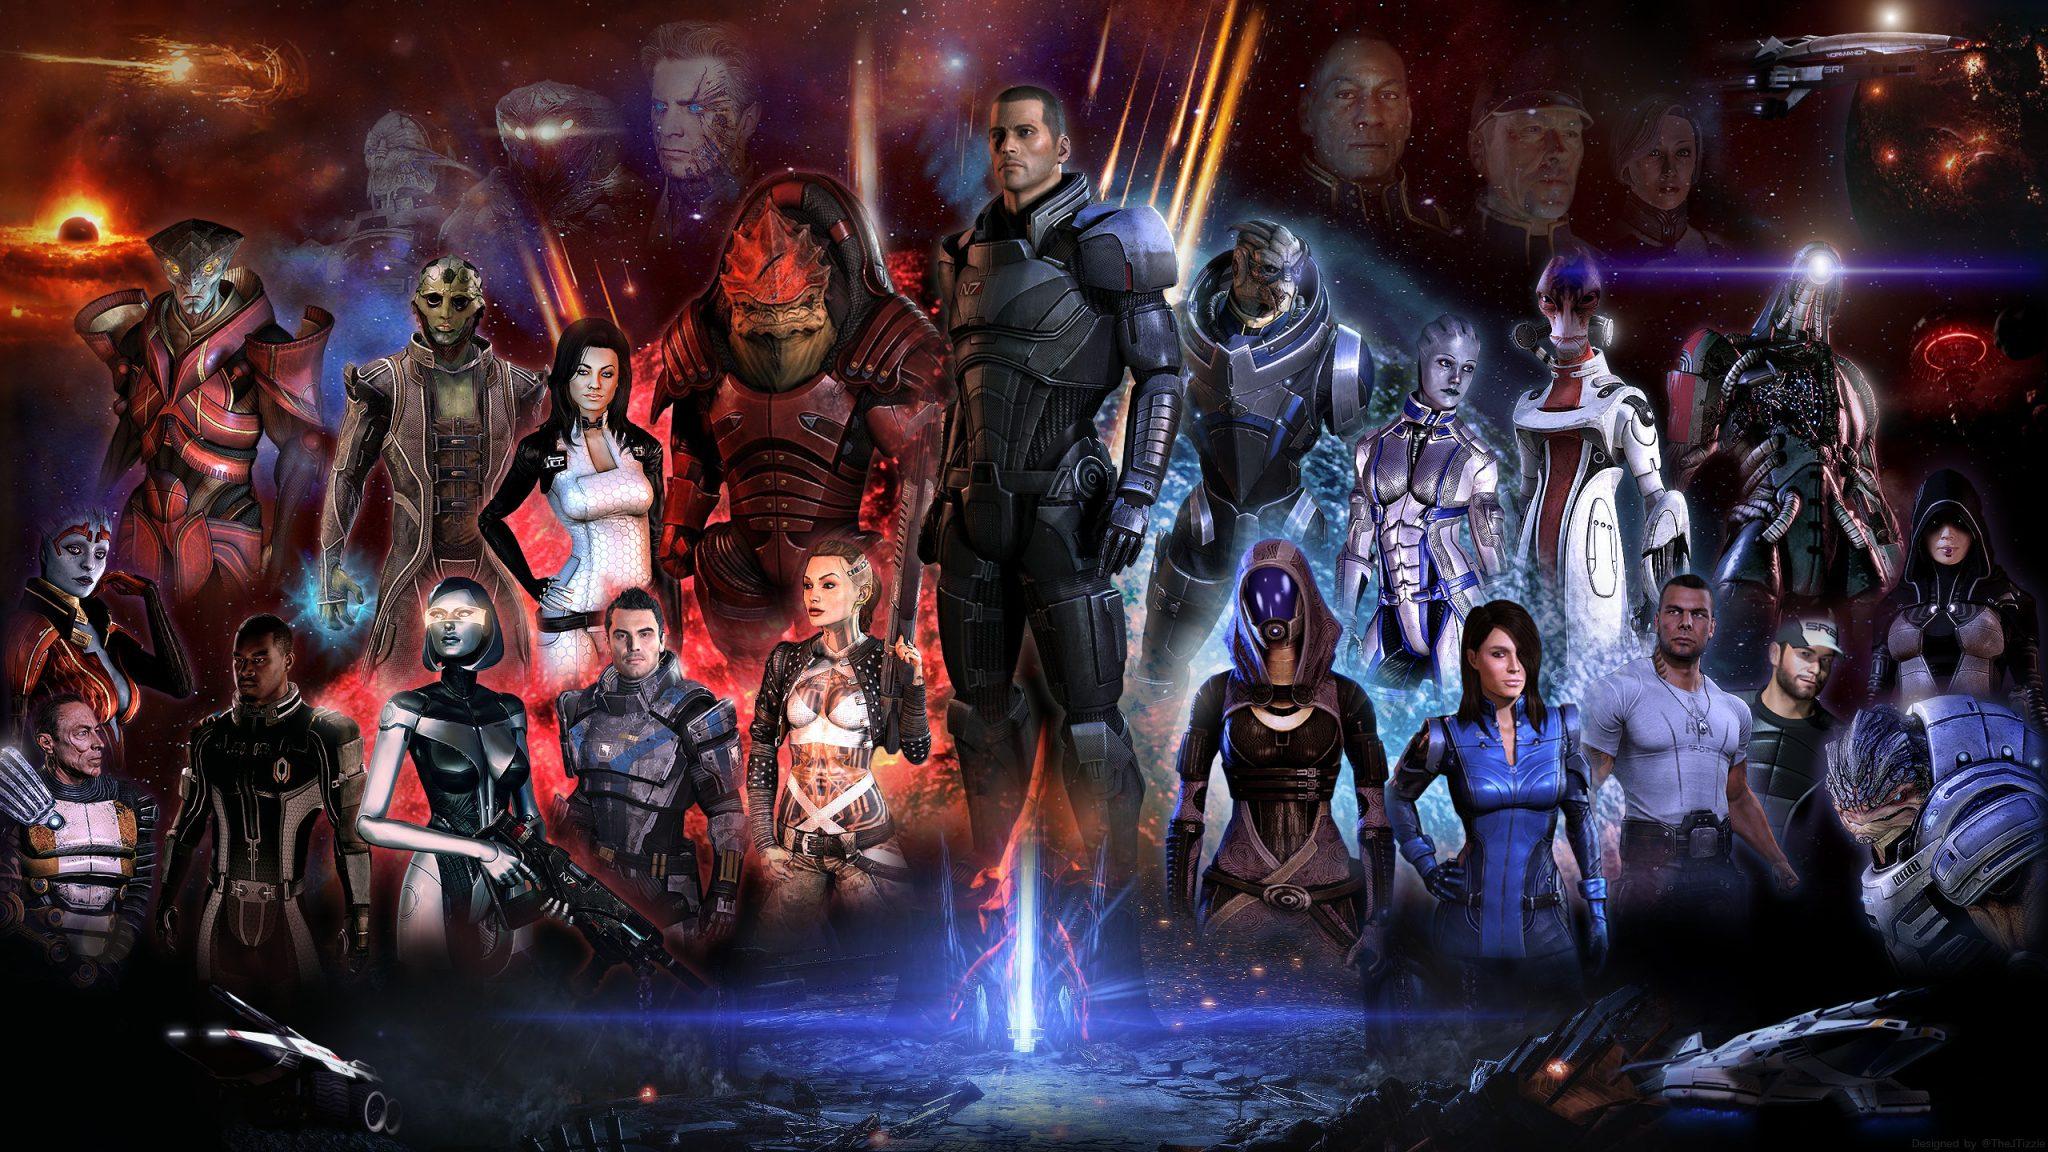 Why A Mass Effect Movie Won't Work